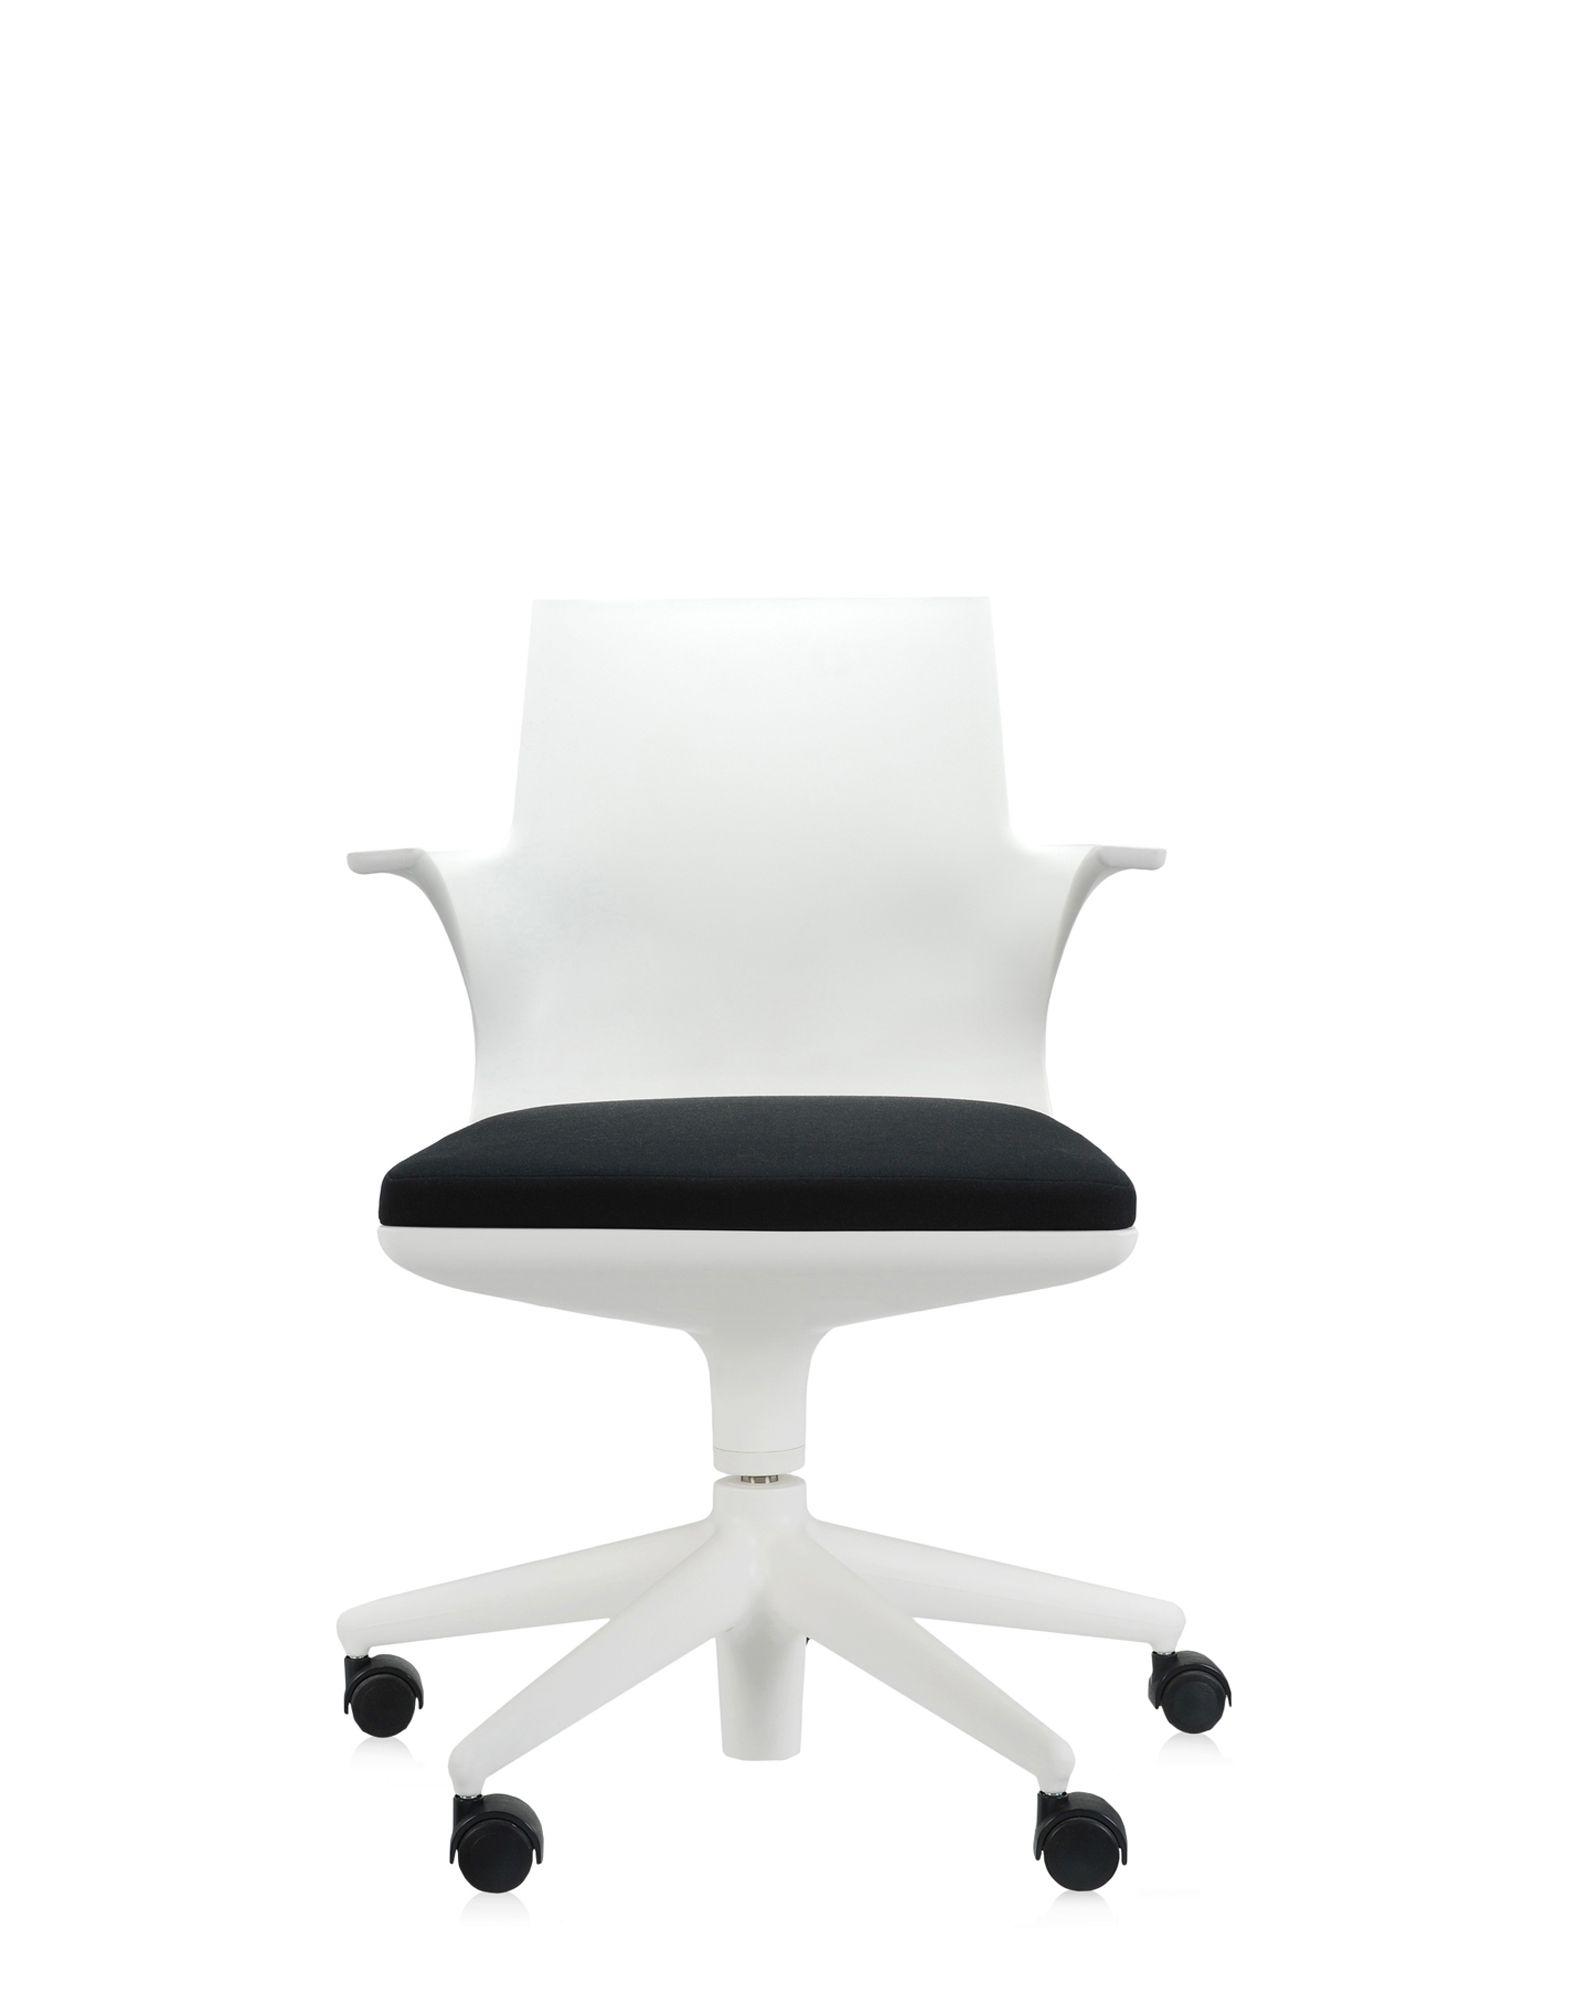 kartell sedia ufficio spoon chair bianco nero sedie